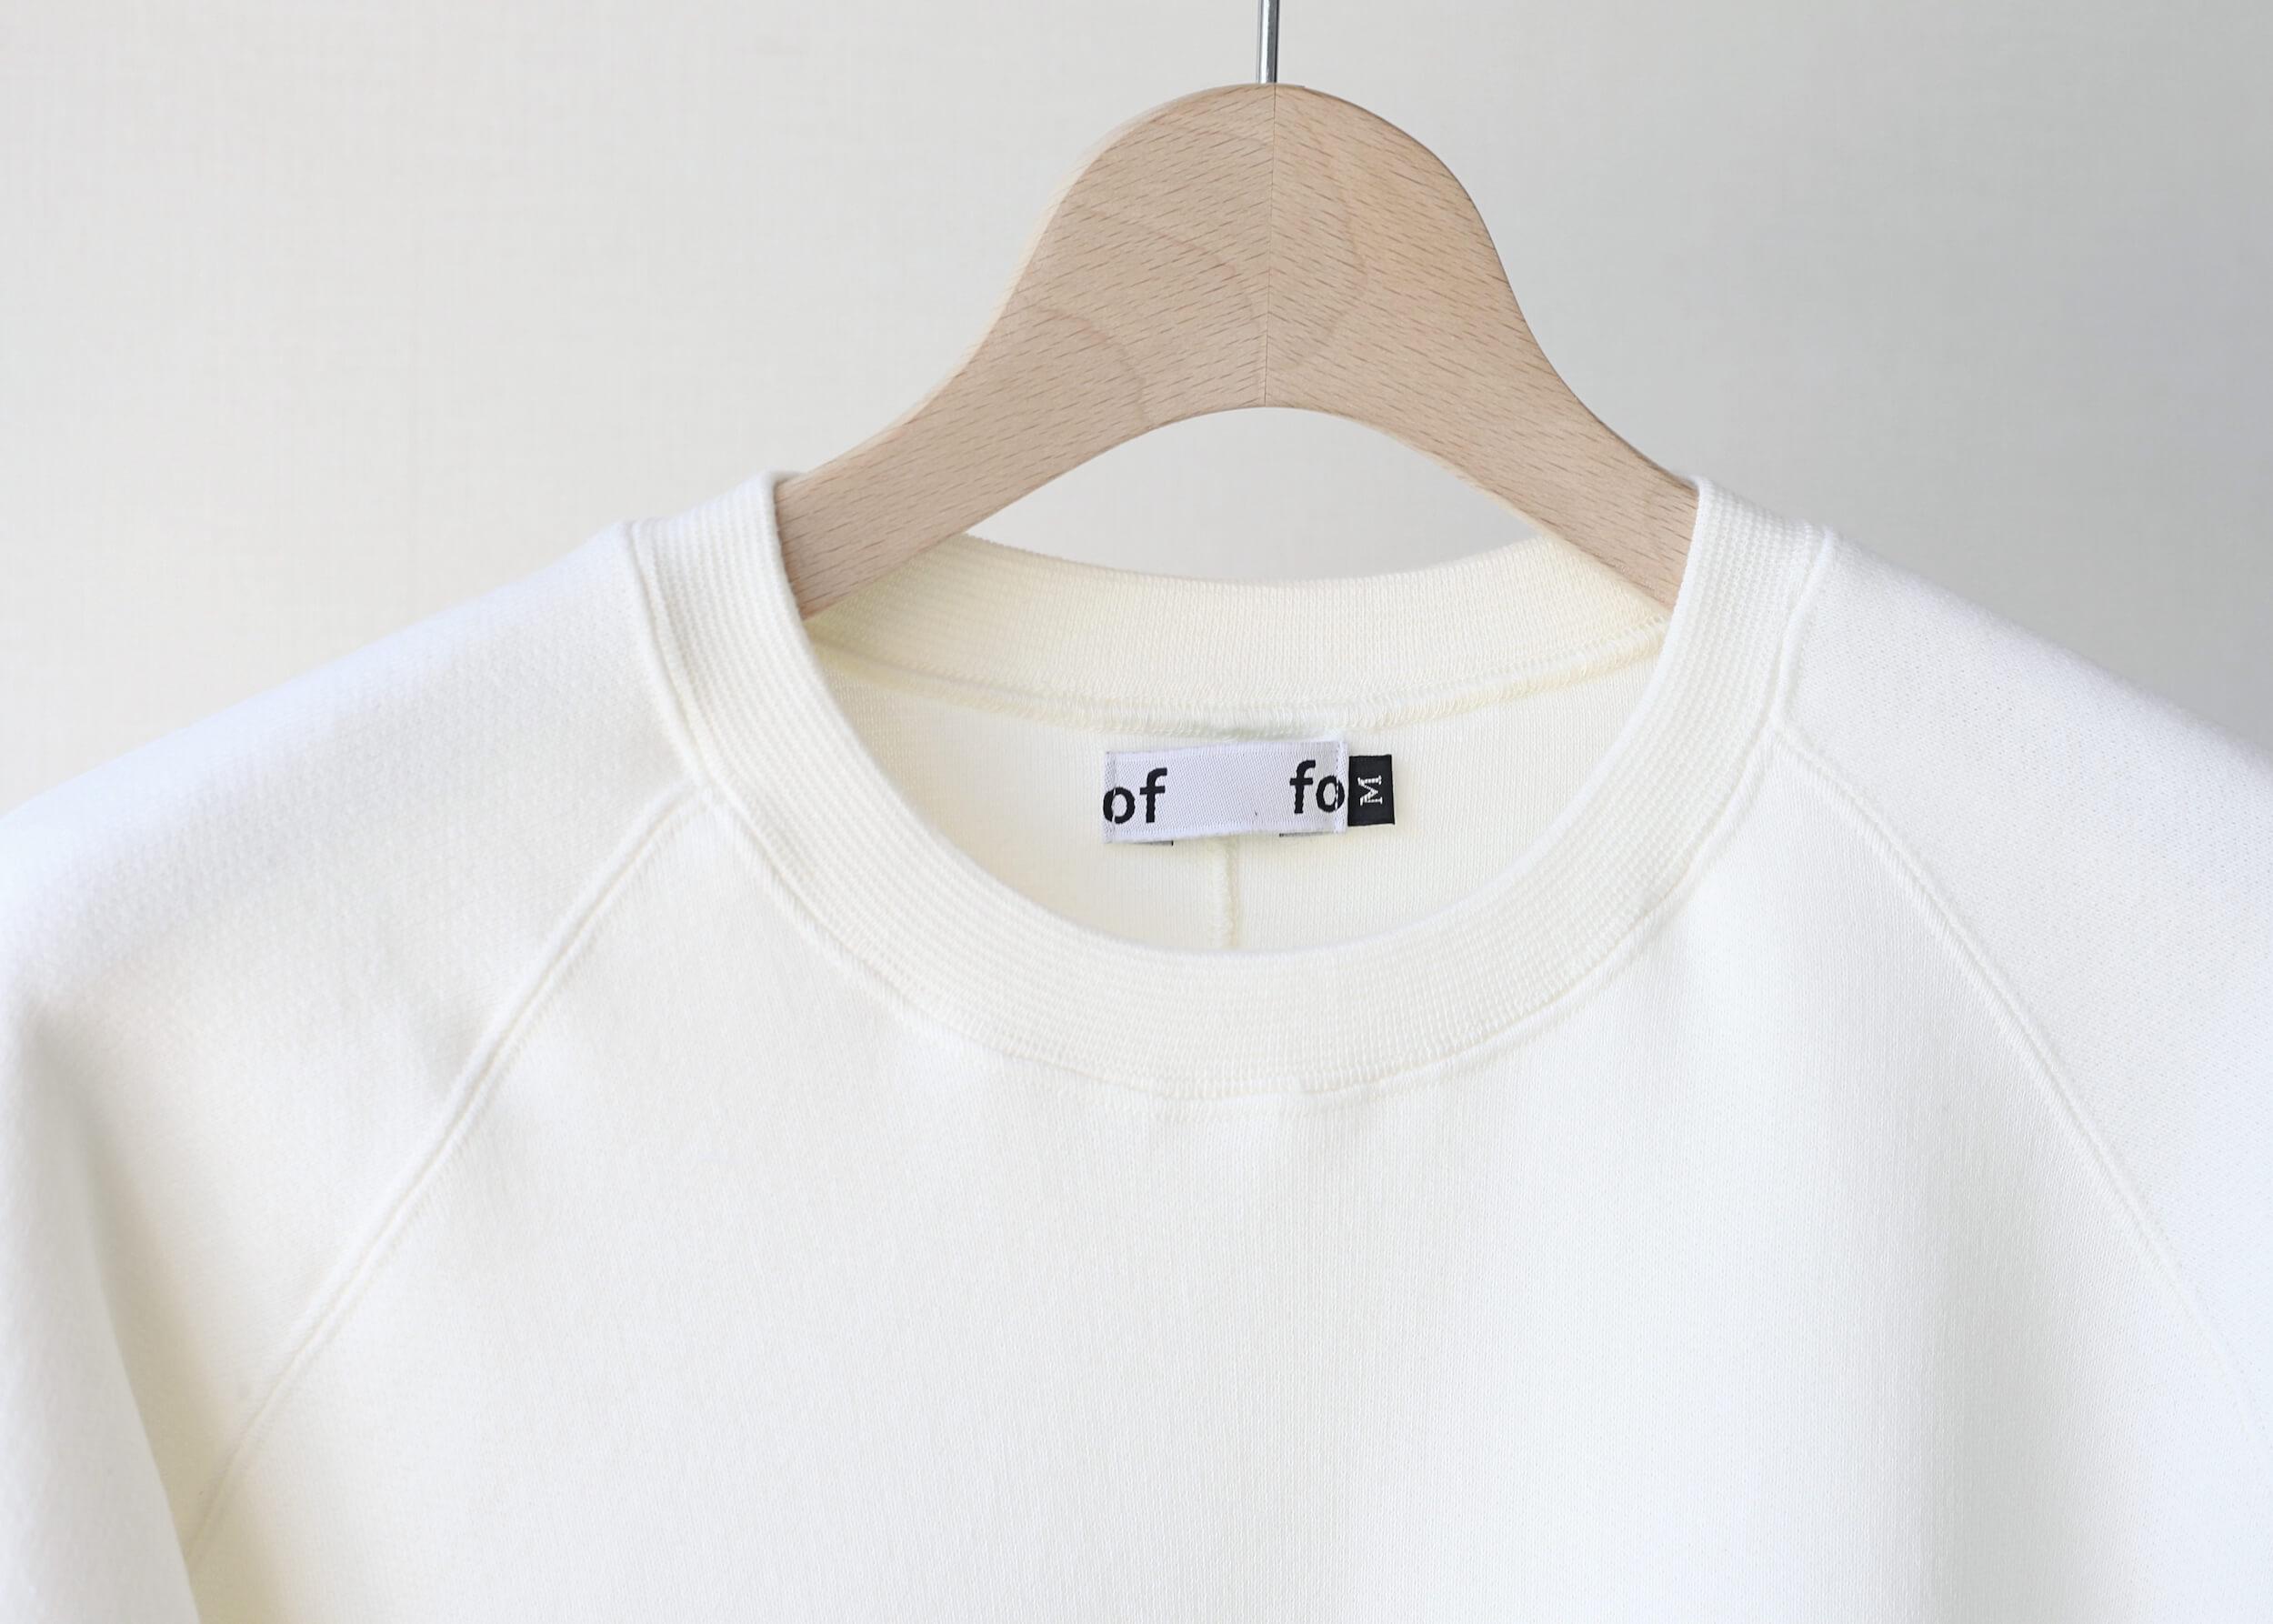 foof - tsuriami sweat pullover offネックのアップ